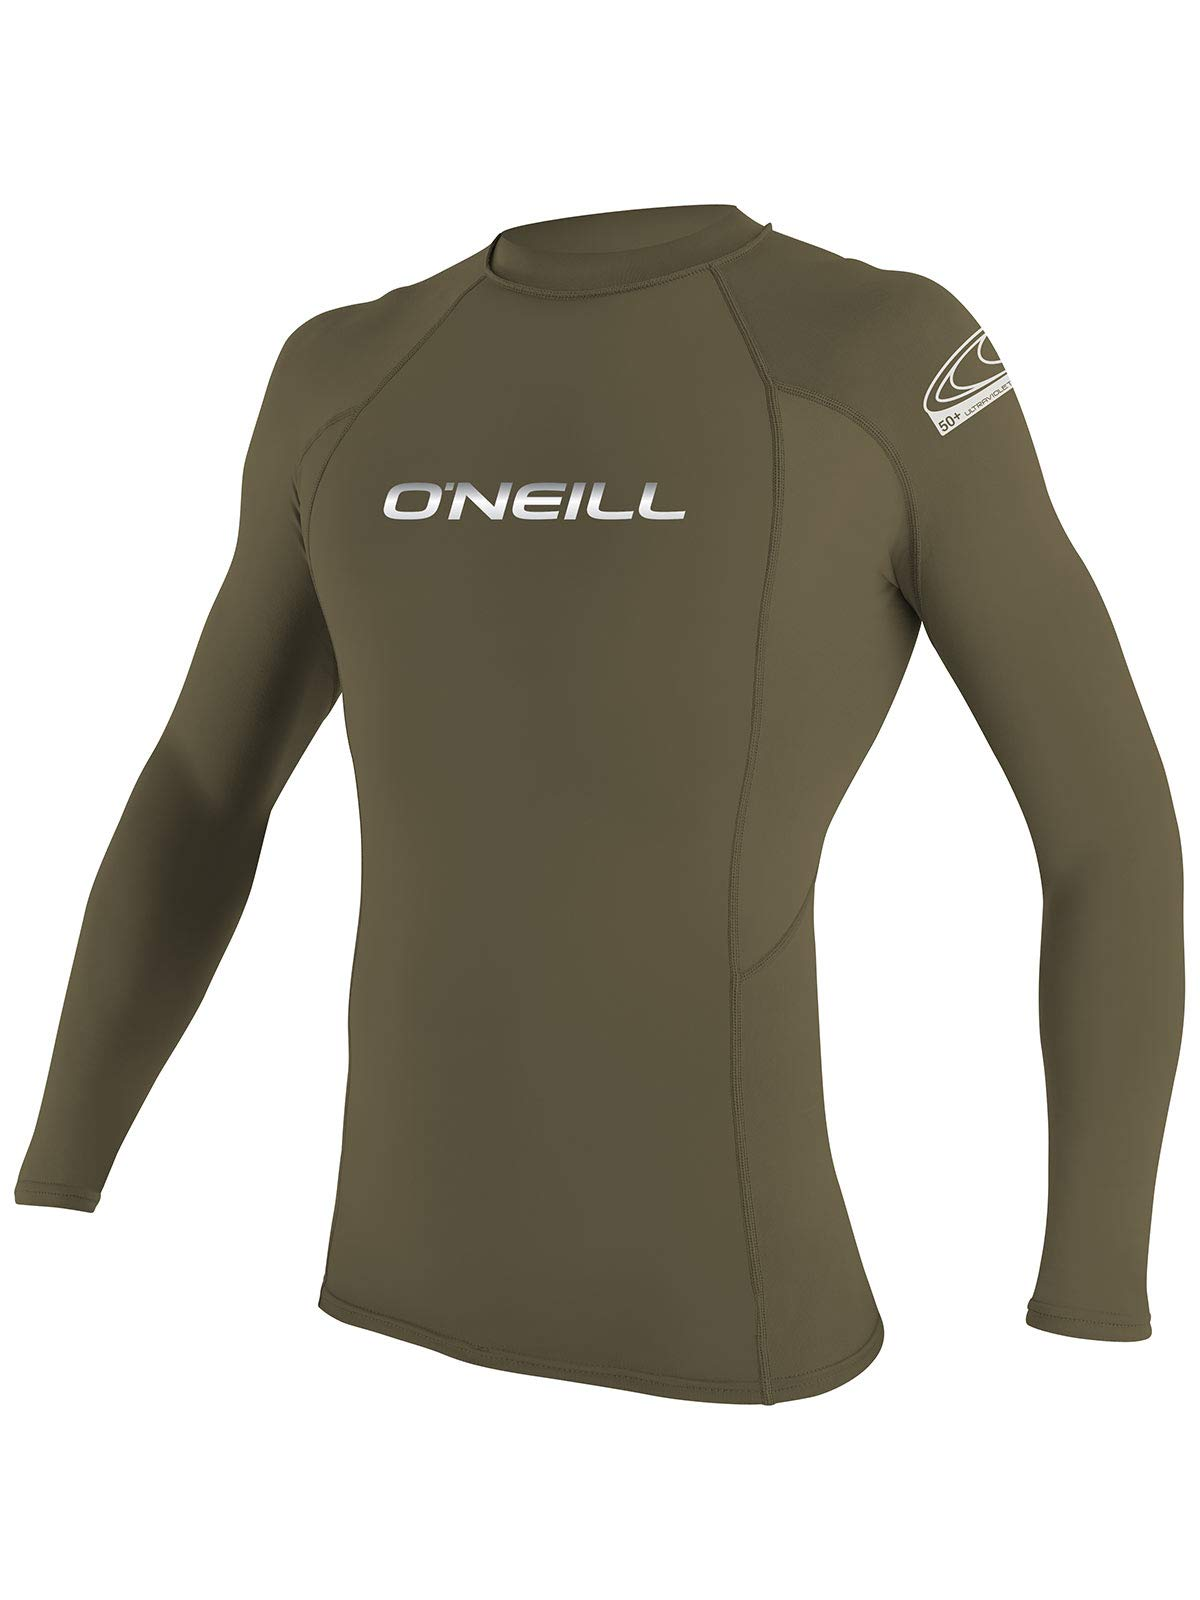 O'Neill Men's Basic Skins Long Sleeve Rashguard 2XL-Tall Khaki (3342IB) by O'Neill Wetsuits